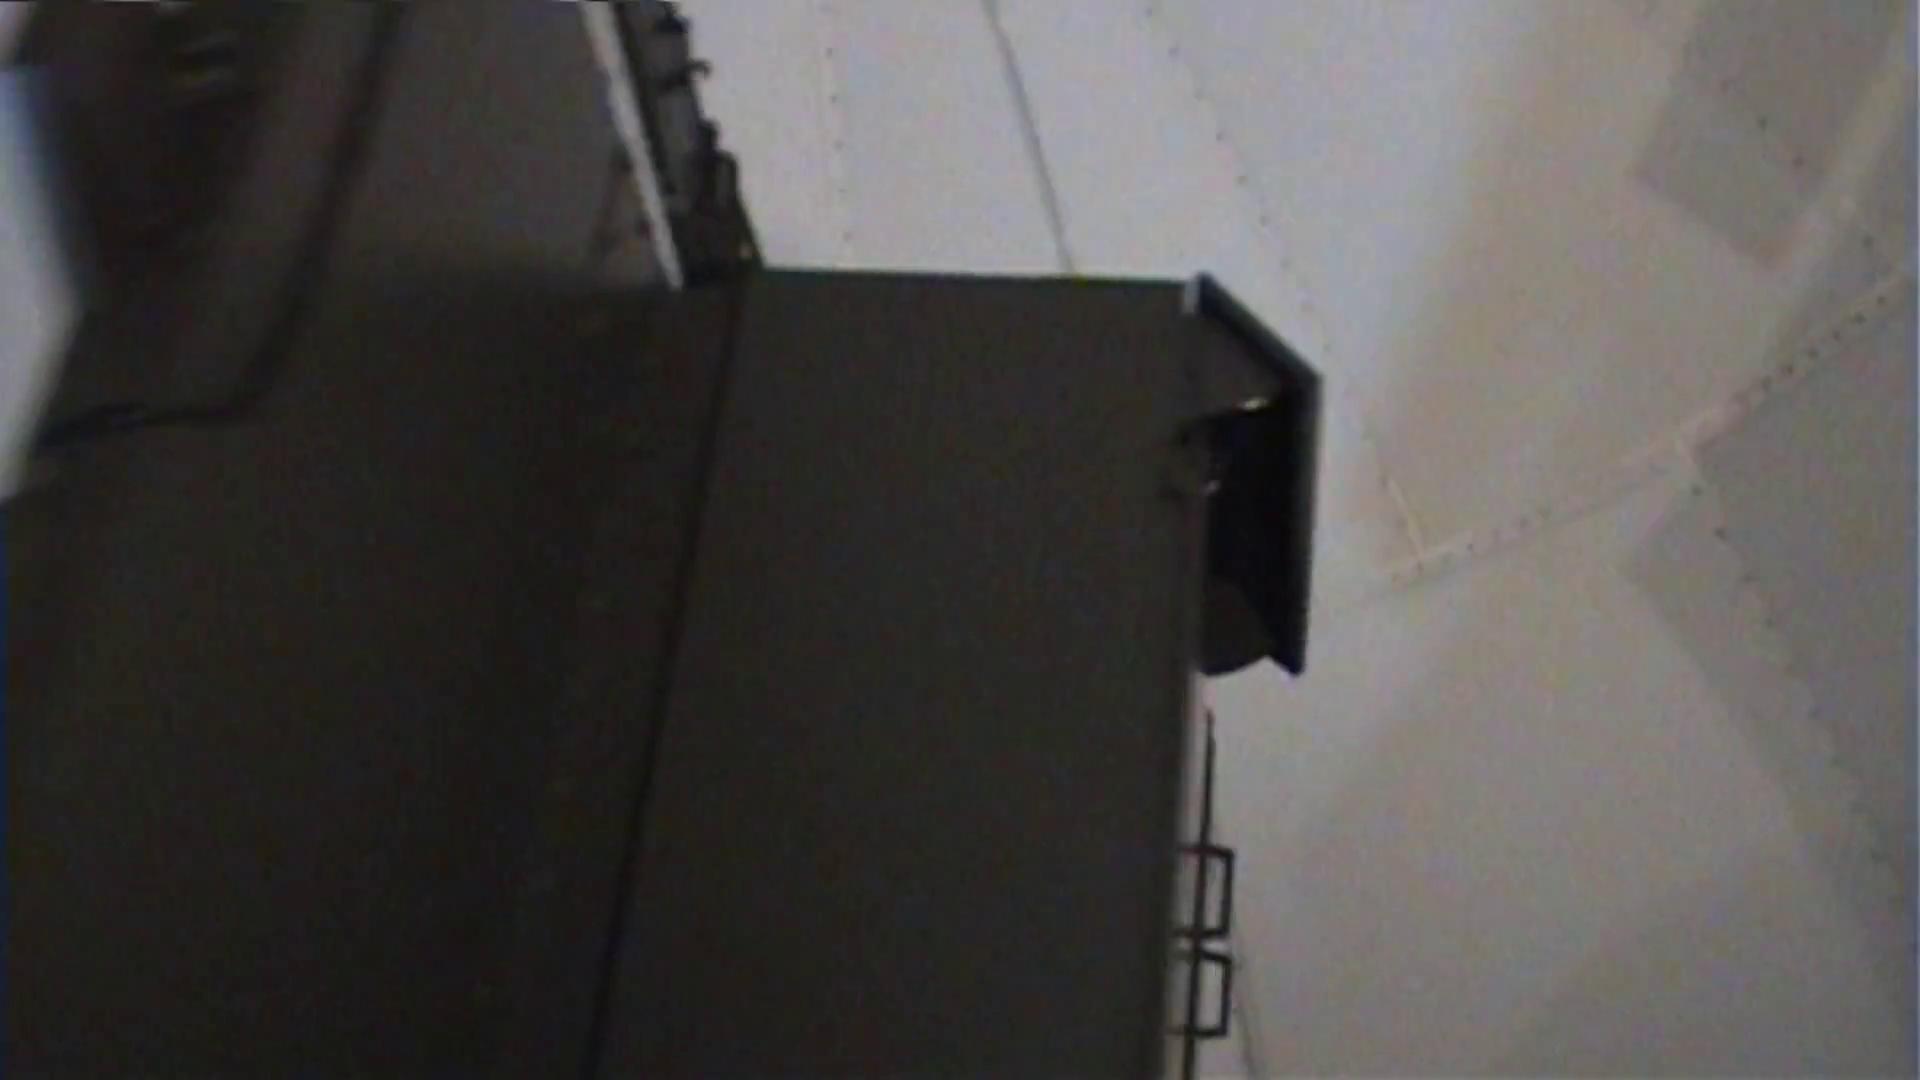 GM403 - Ground Master 403 radar systems for Morocco/Radars GM403 pour le Maroc - Page 2 Clipb343